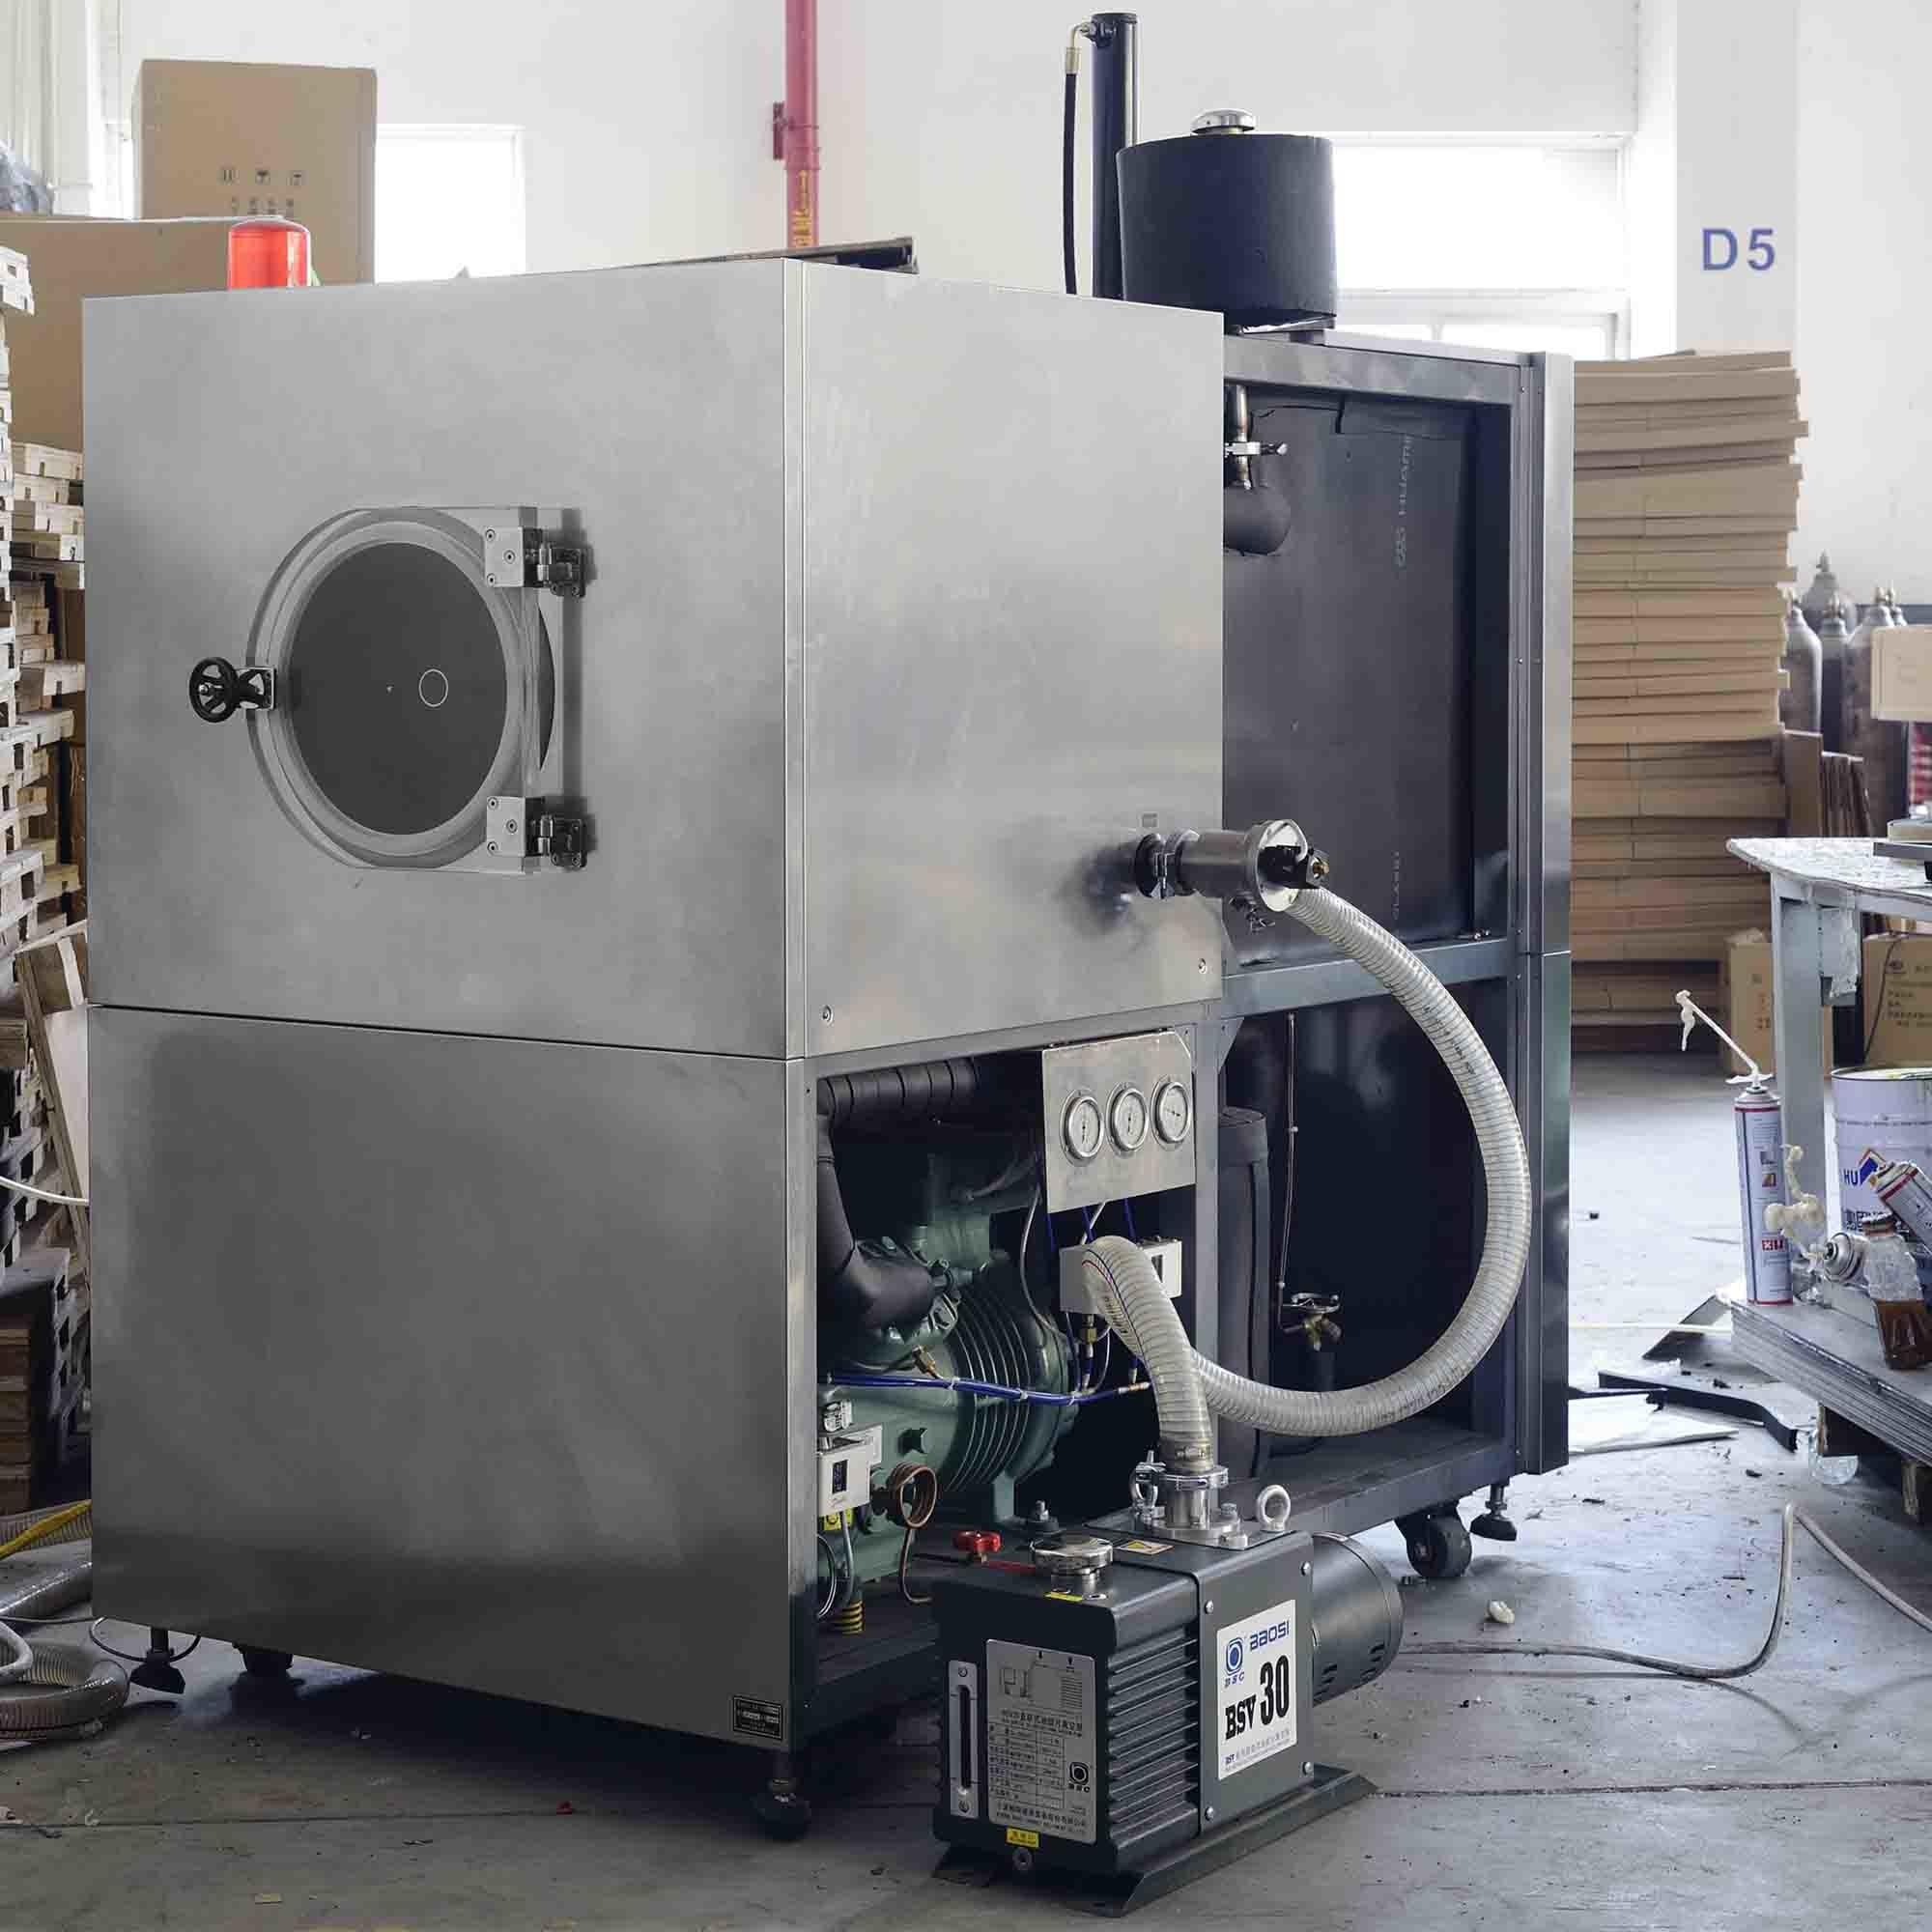 bsv30 oil rotary vane type vacuum pump 30m3 h for refrigerator refrigerant charging